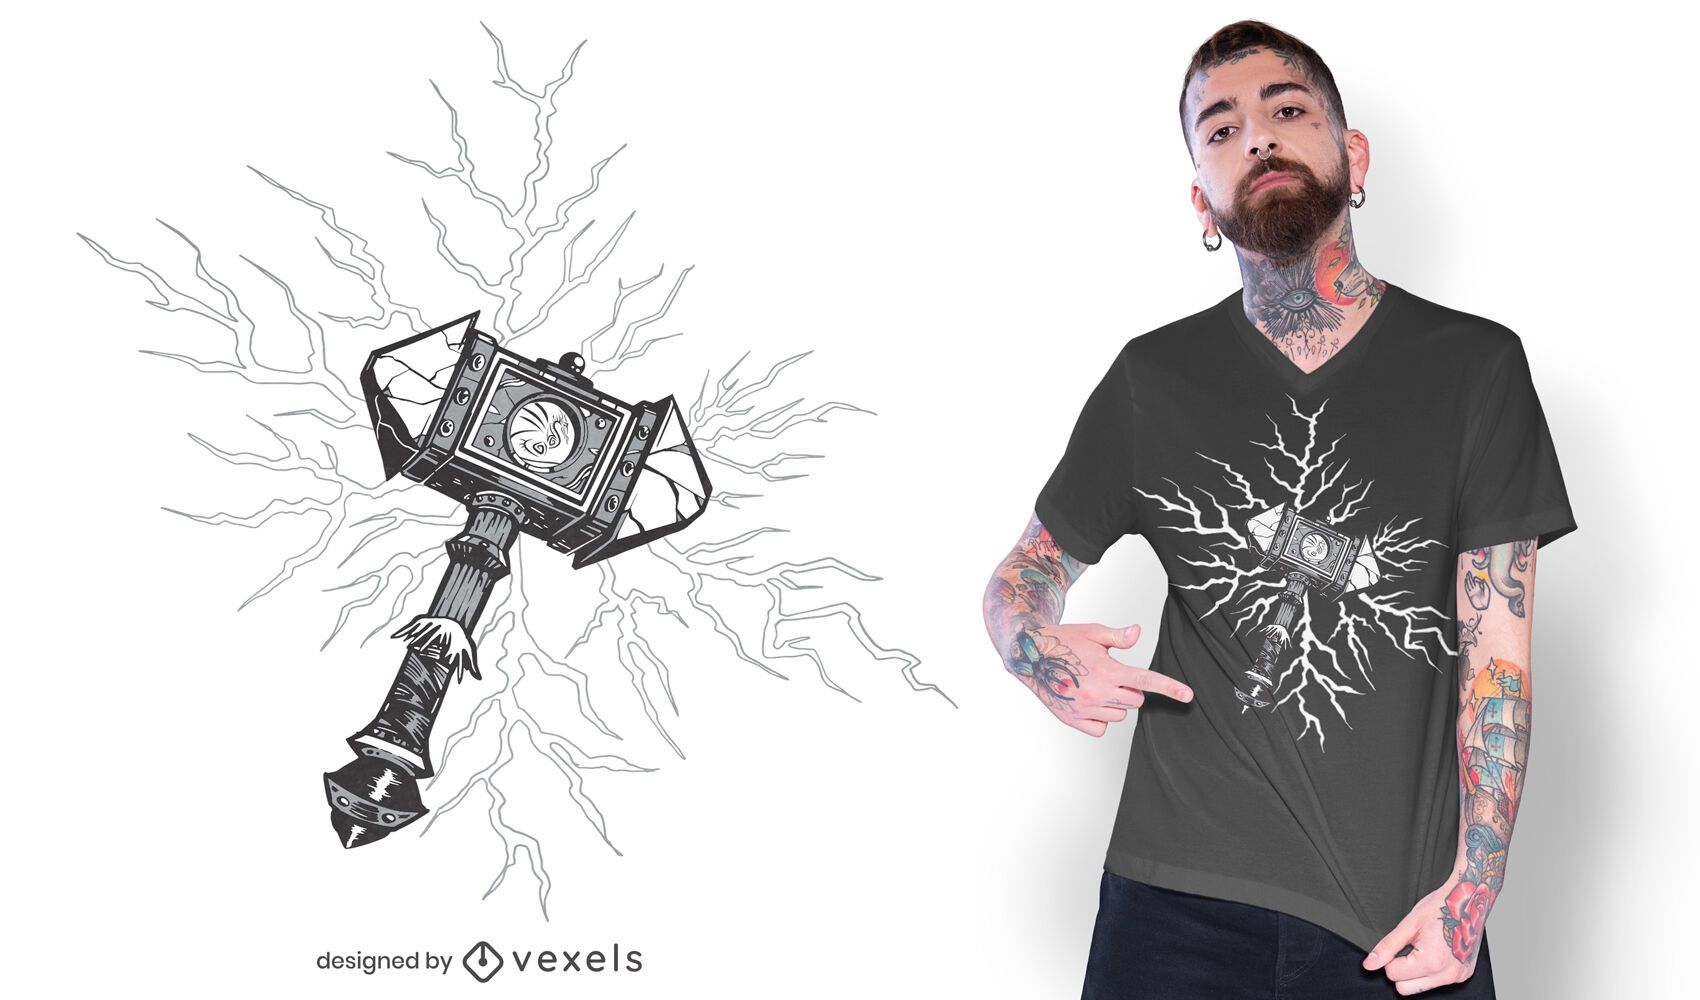 Viking hammer t-shirt design